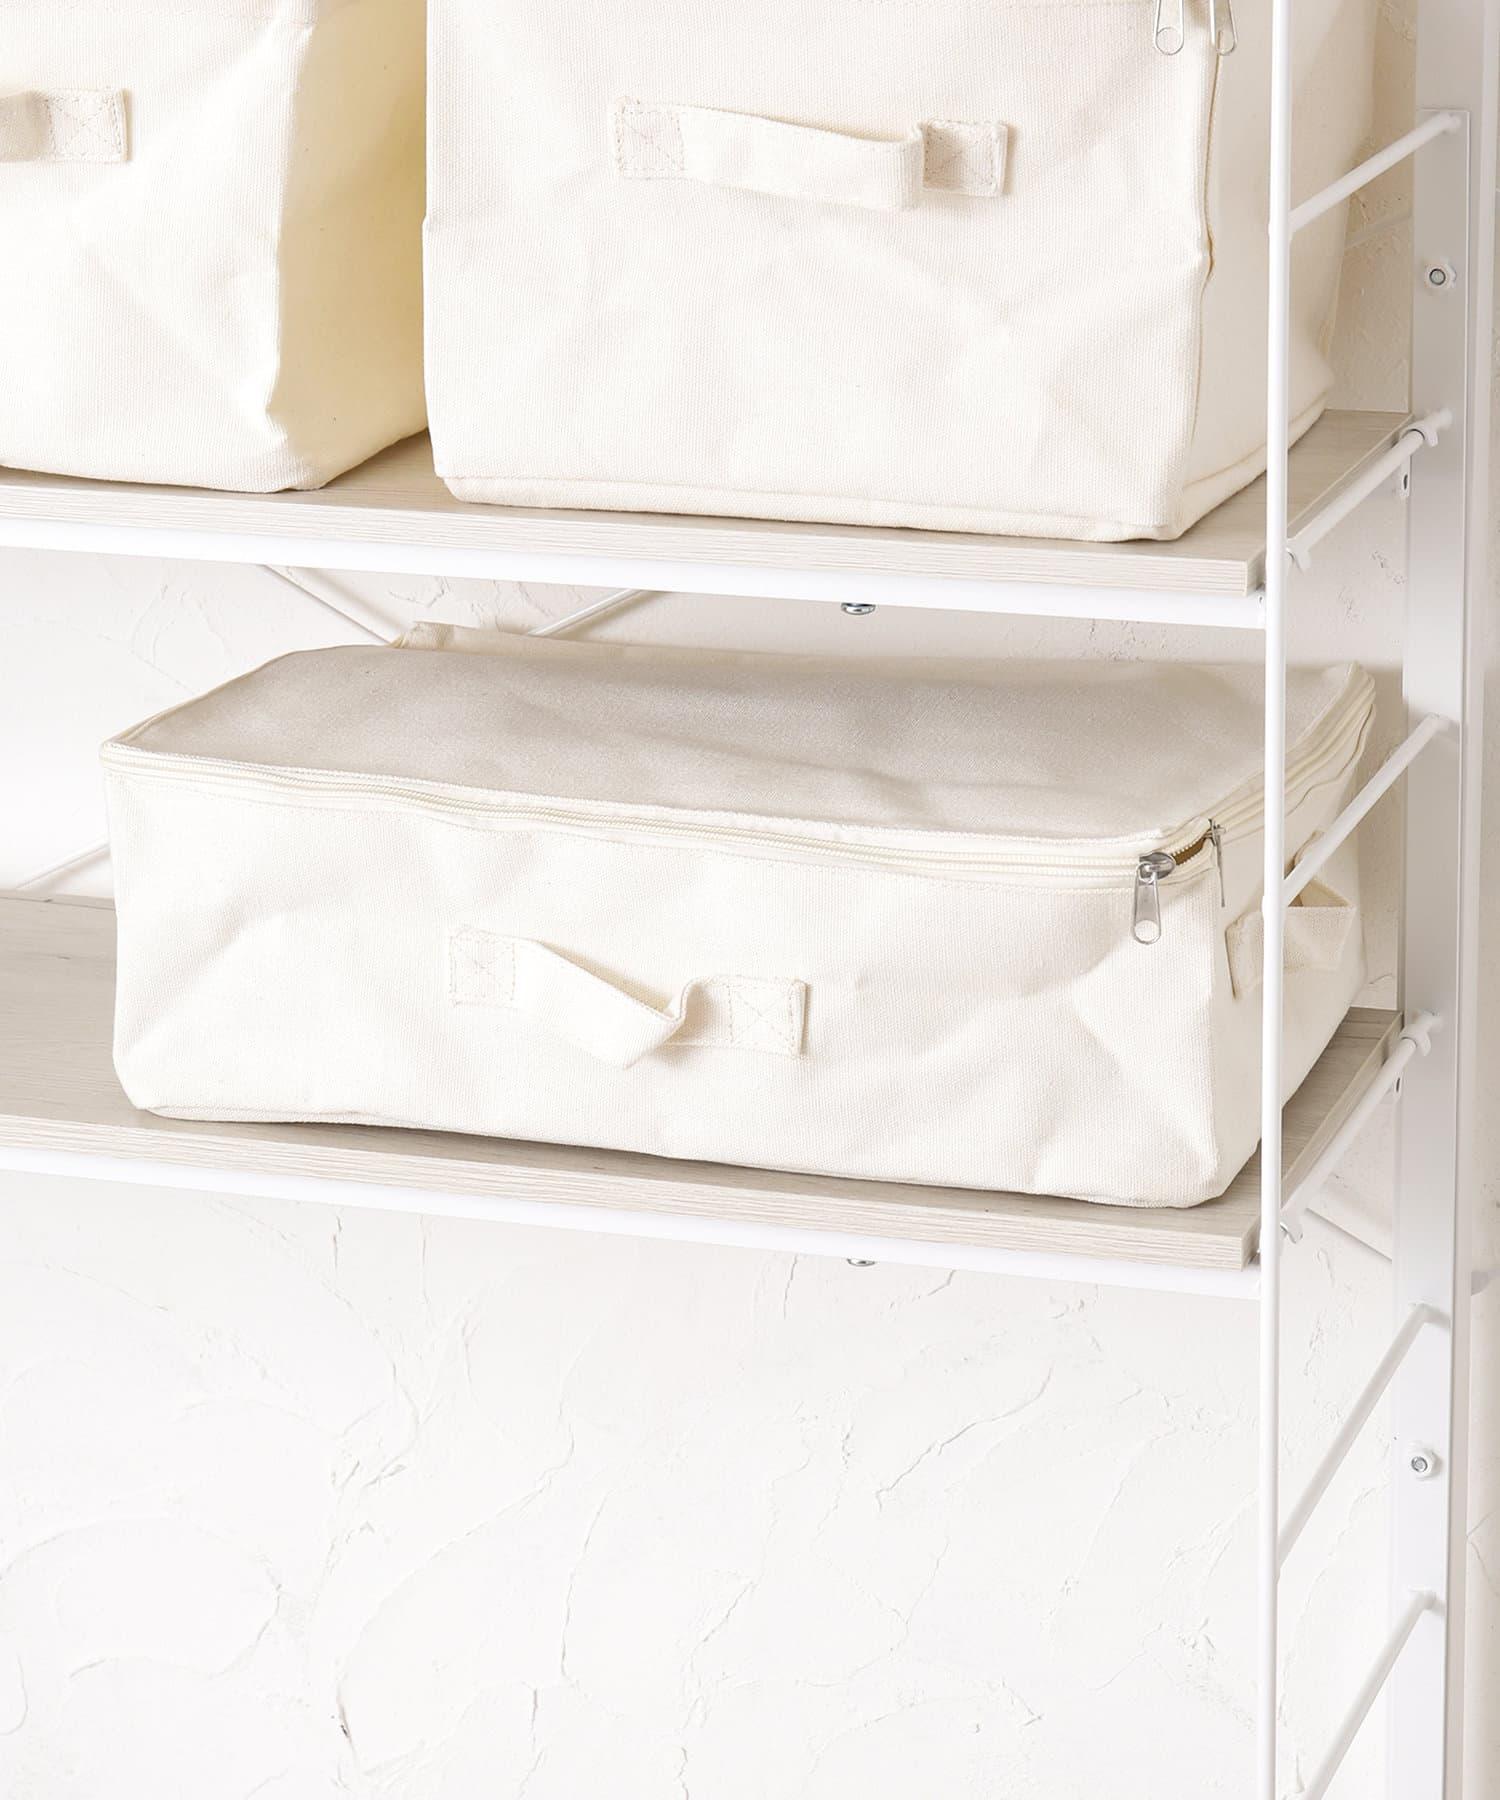 3COINS(スリーコインズ) ライフスタイル コットンフタ付フラット収納ボックス アイボリー